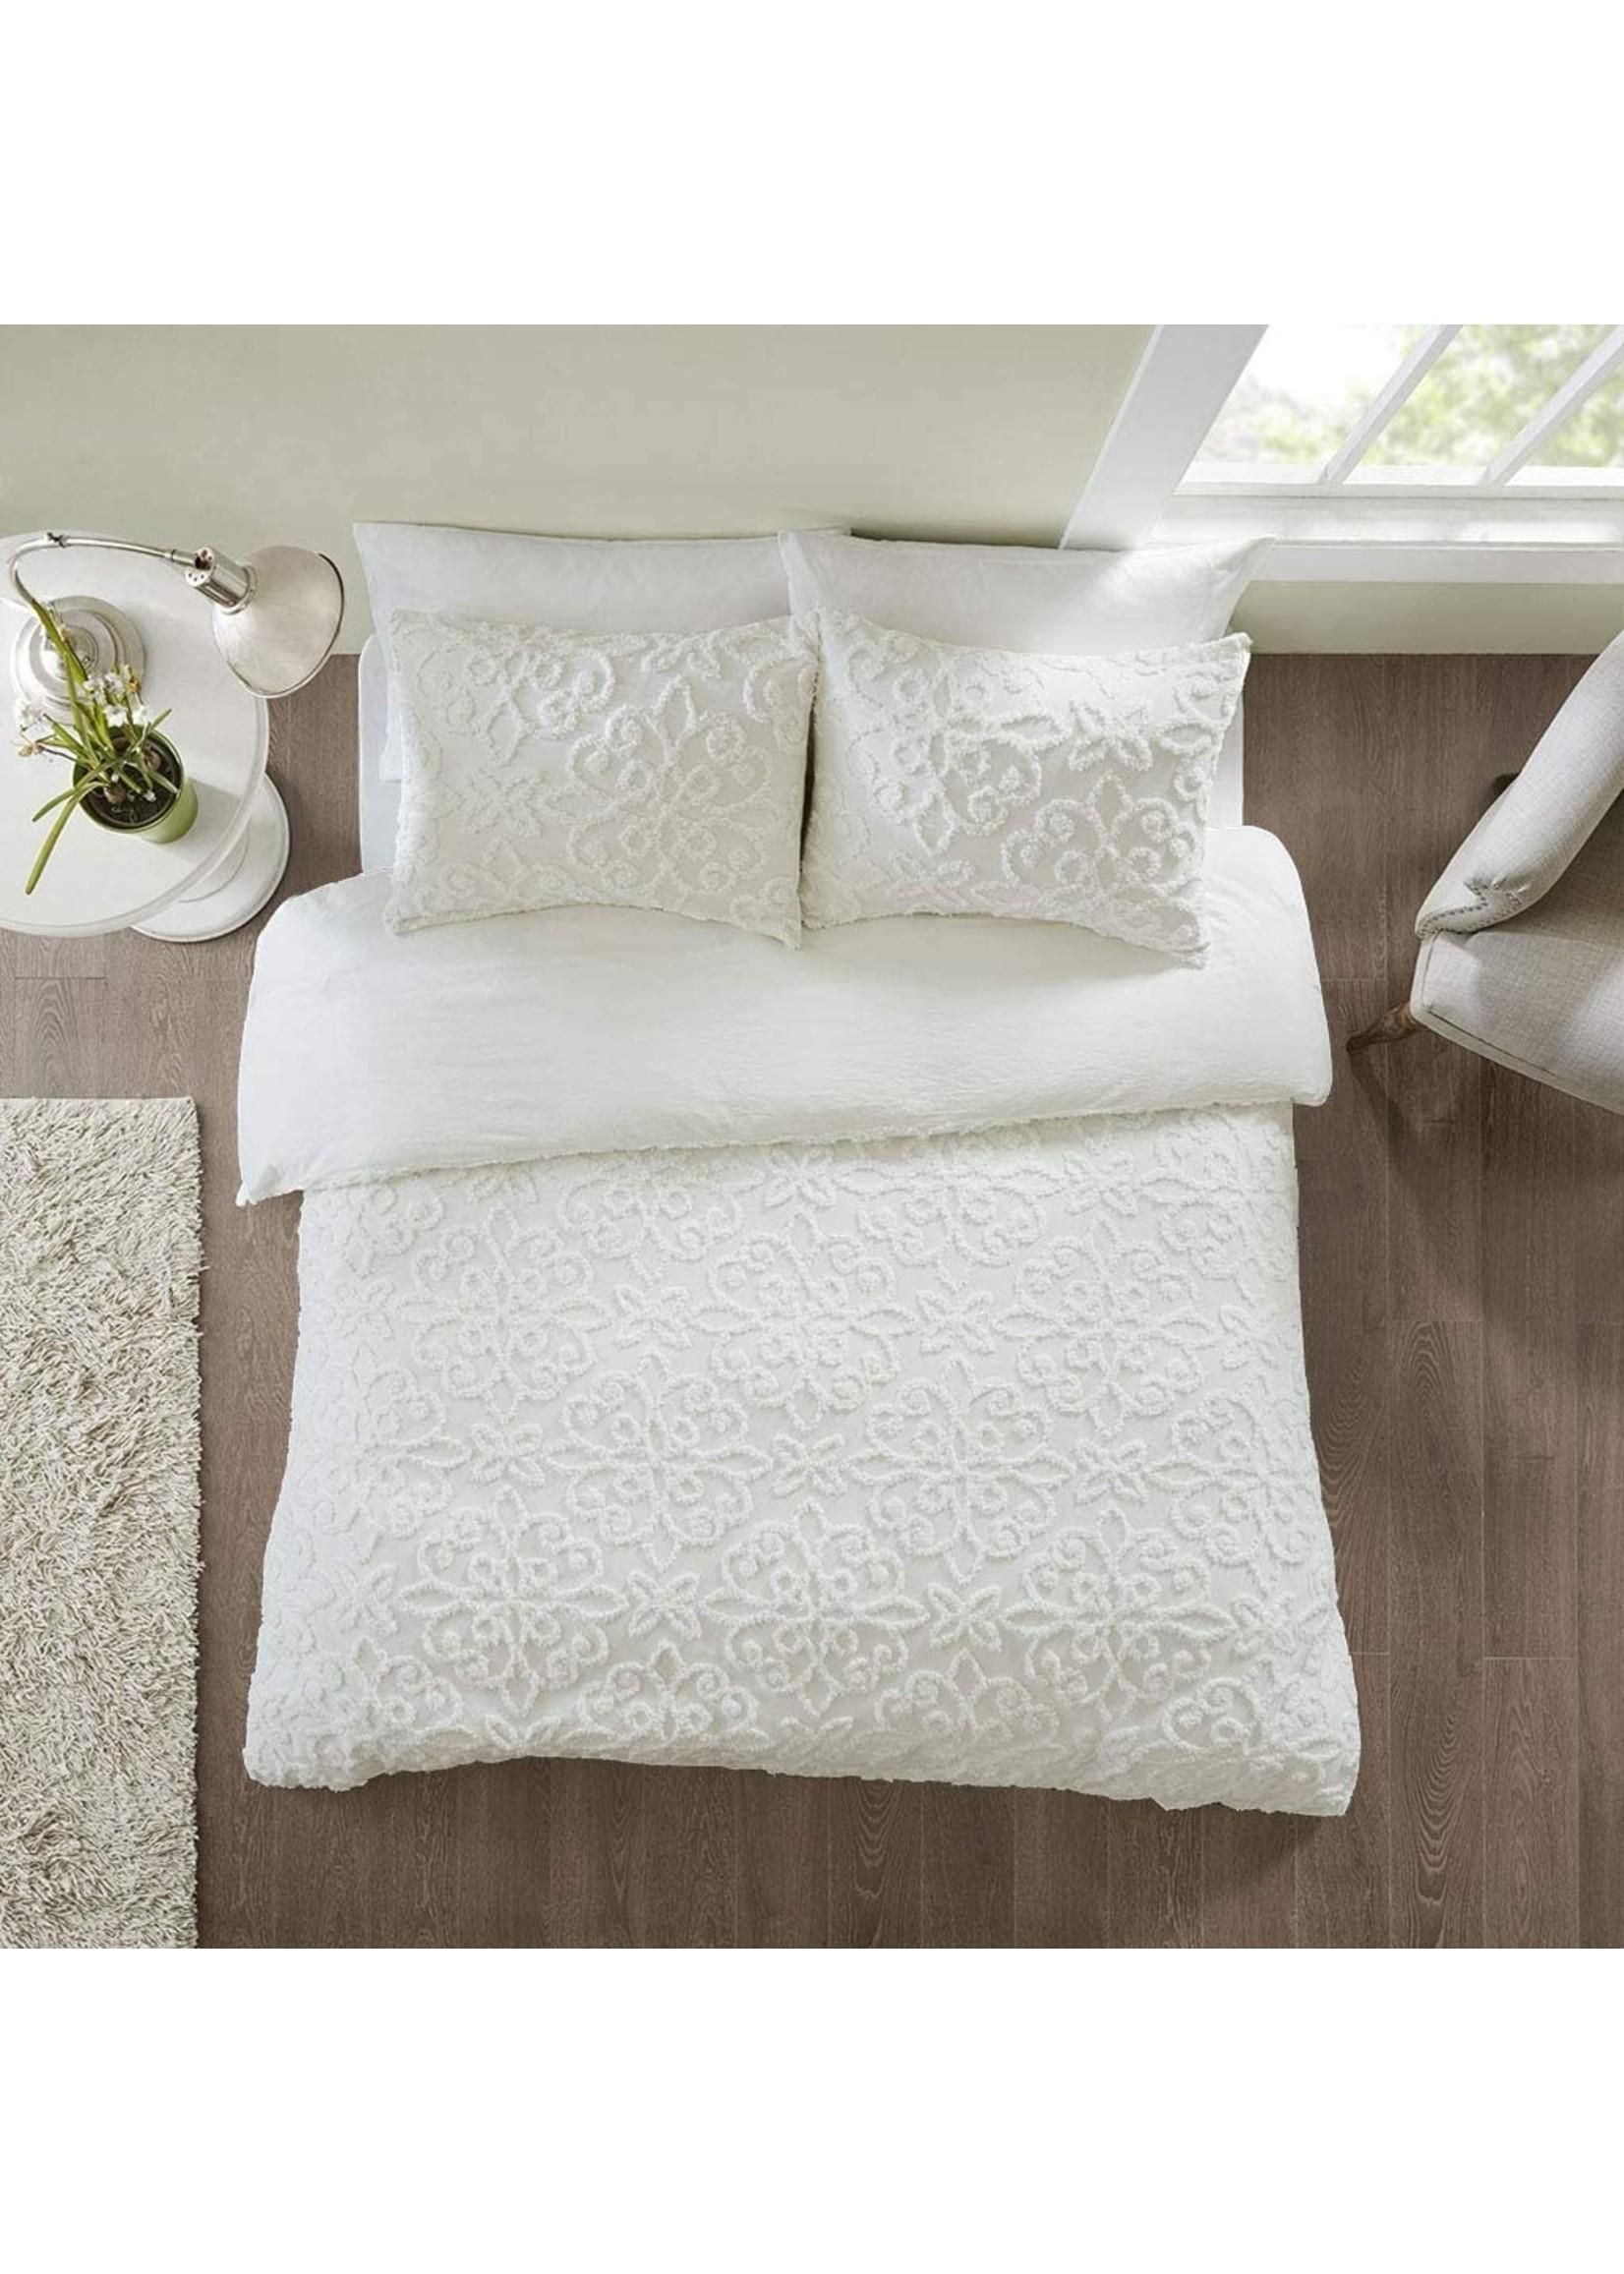 Olliix Madison Park Sabrina 3-Piece Duvet Cover Set - Ivory,  King